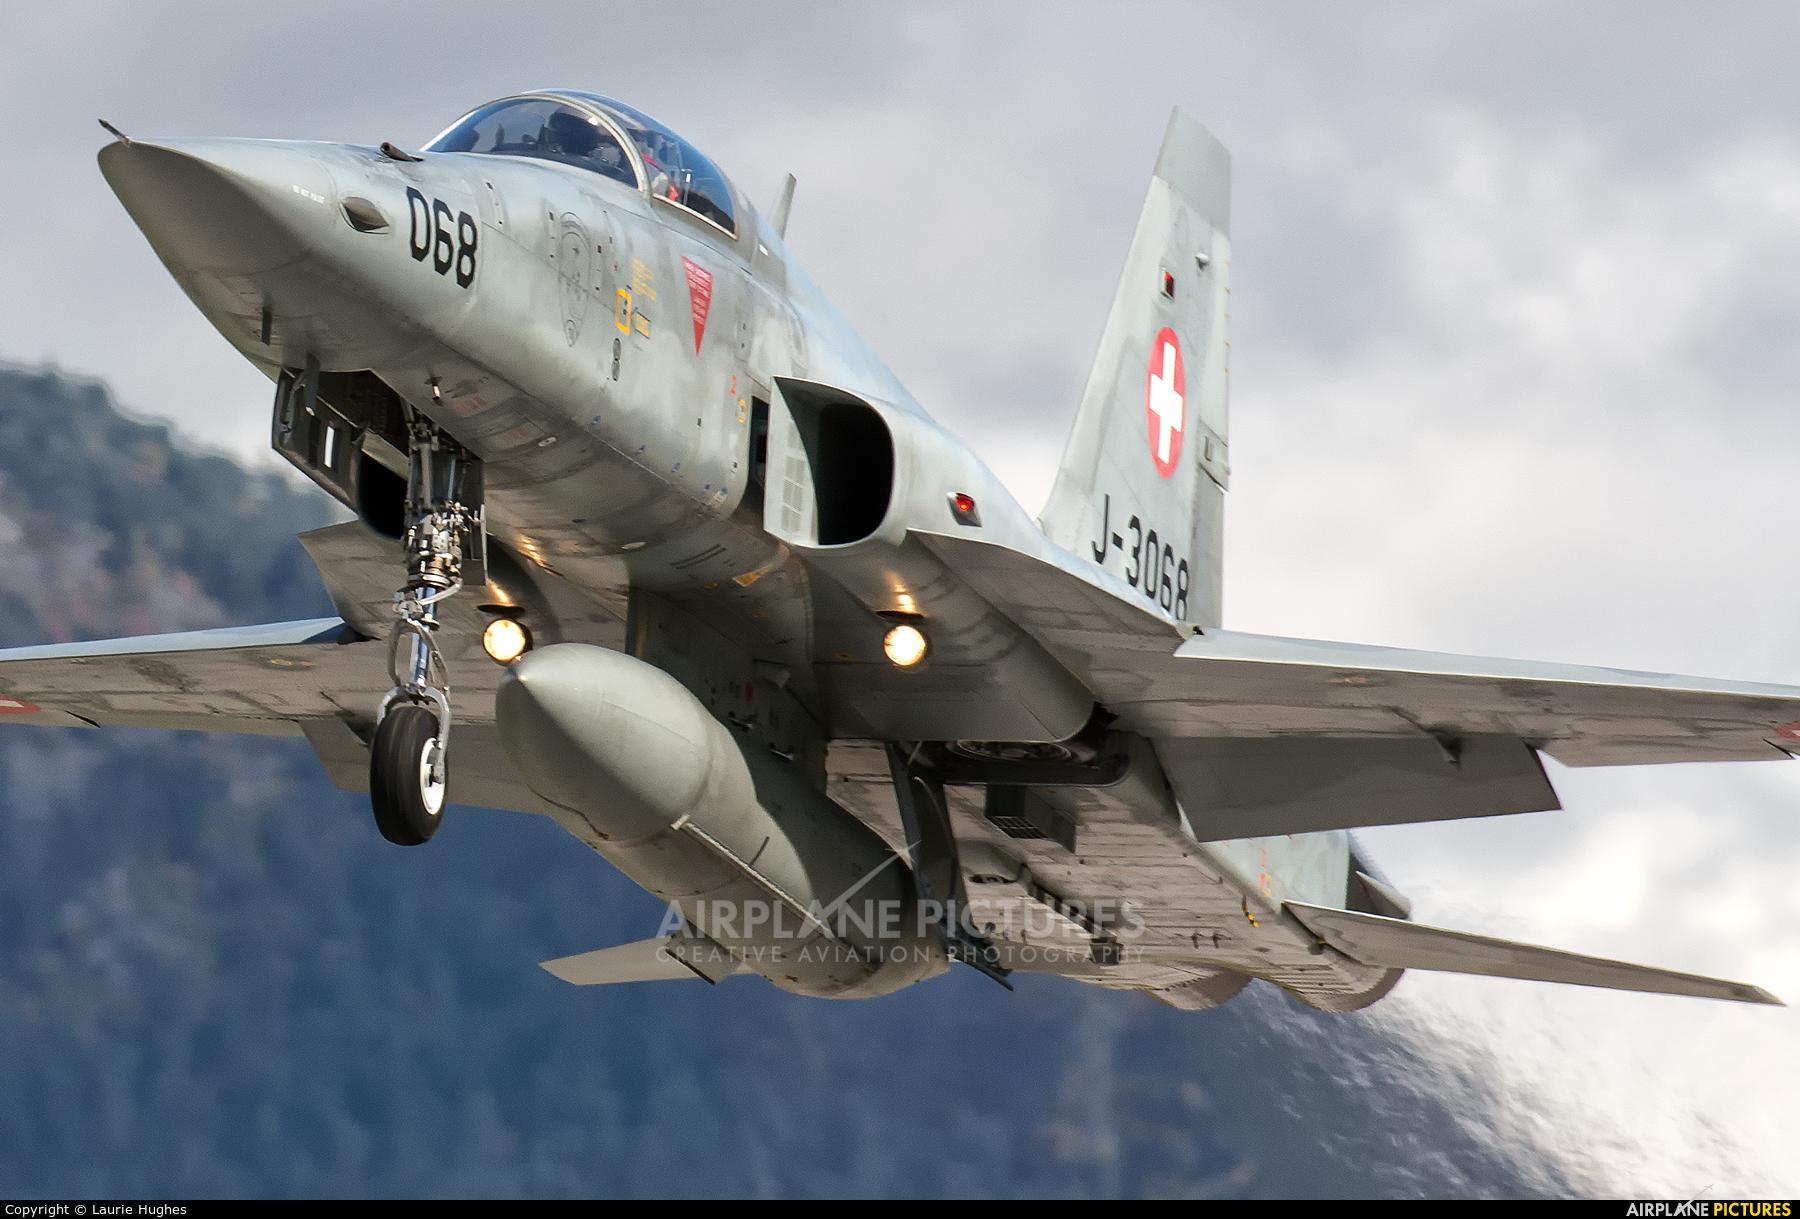 Switzerland - Air Force J-3068 aircraft at Sion